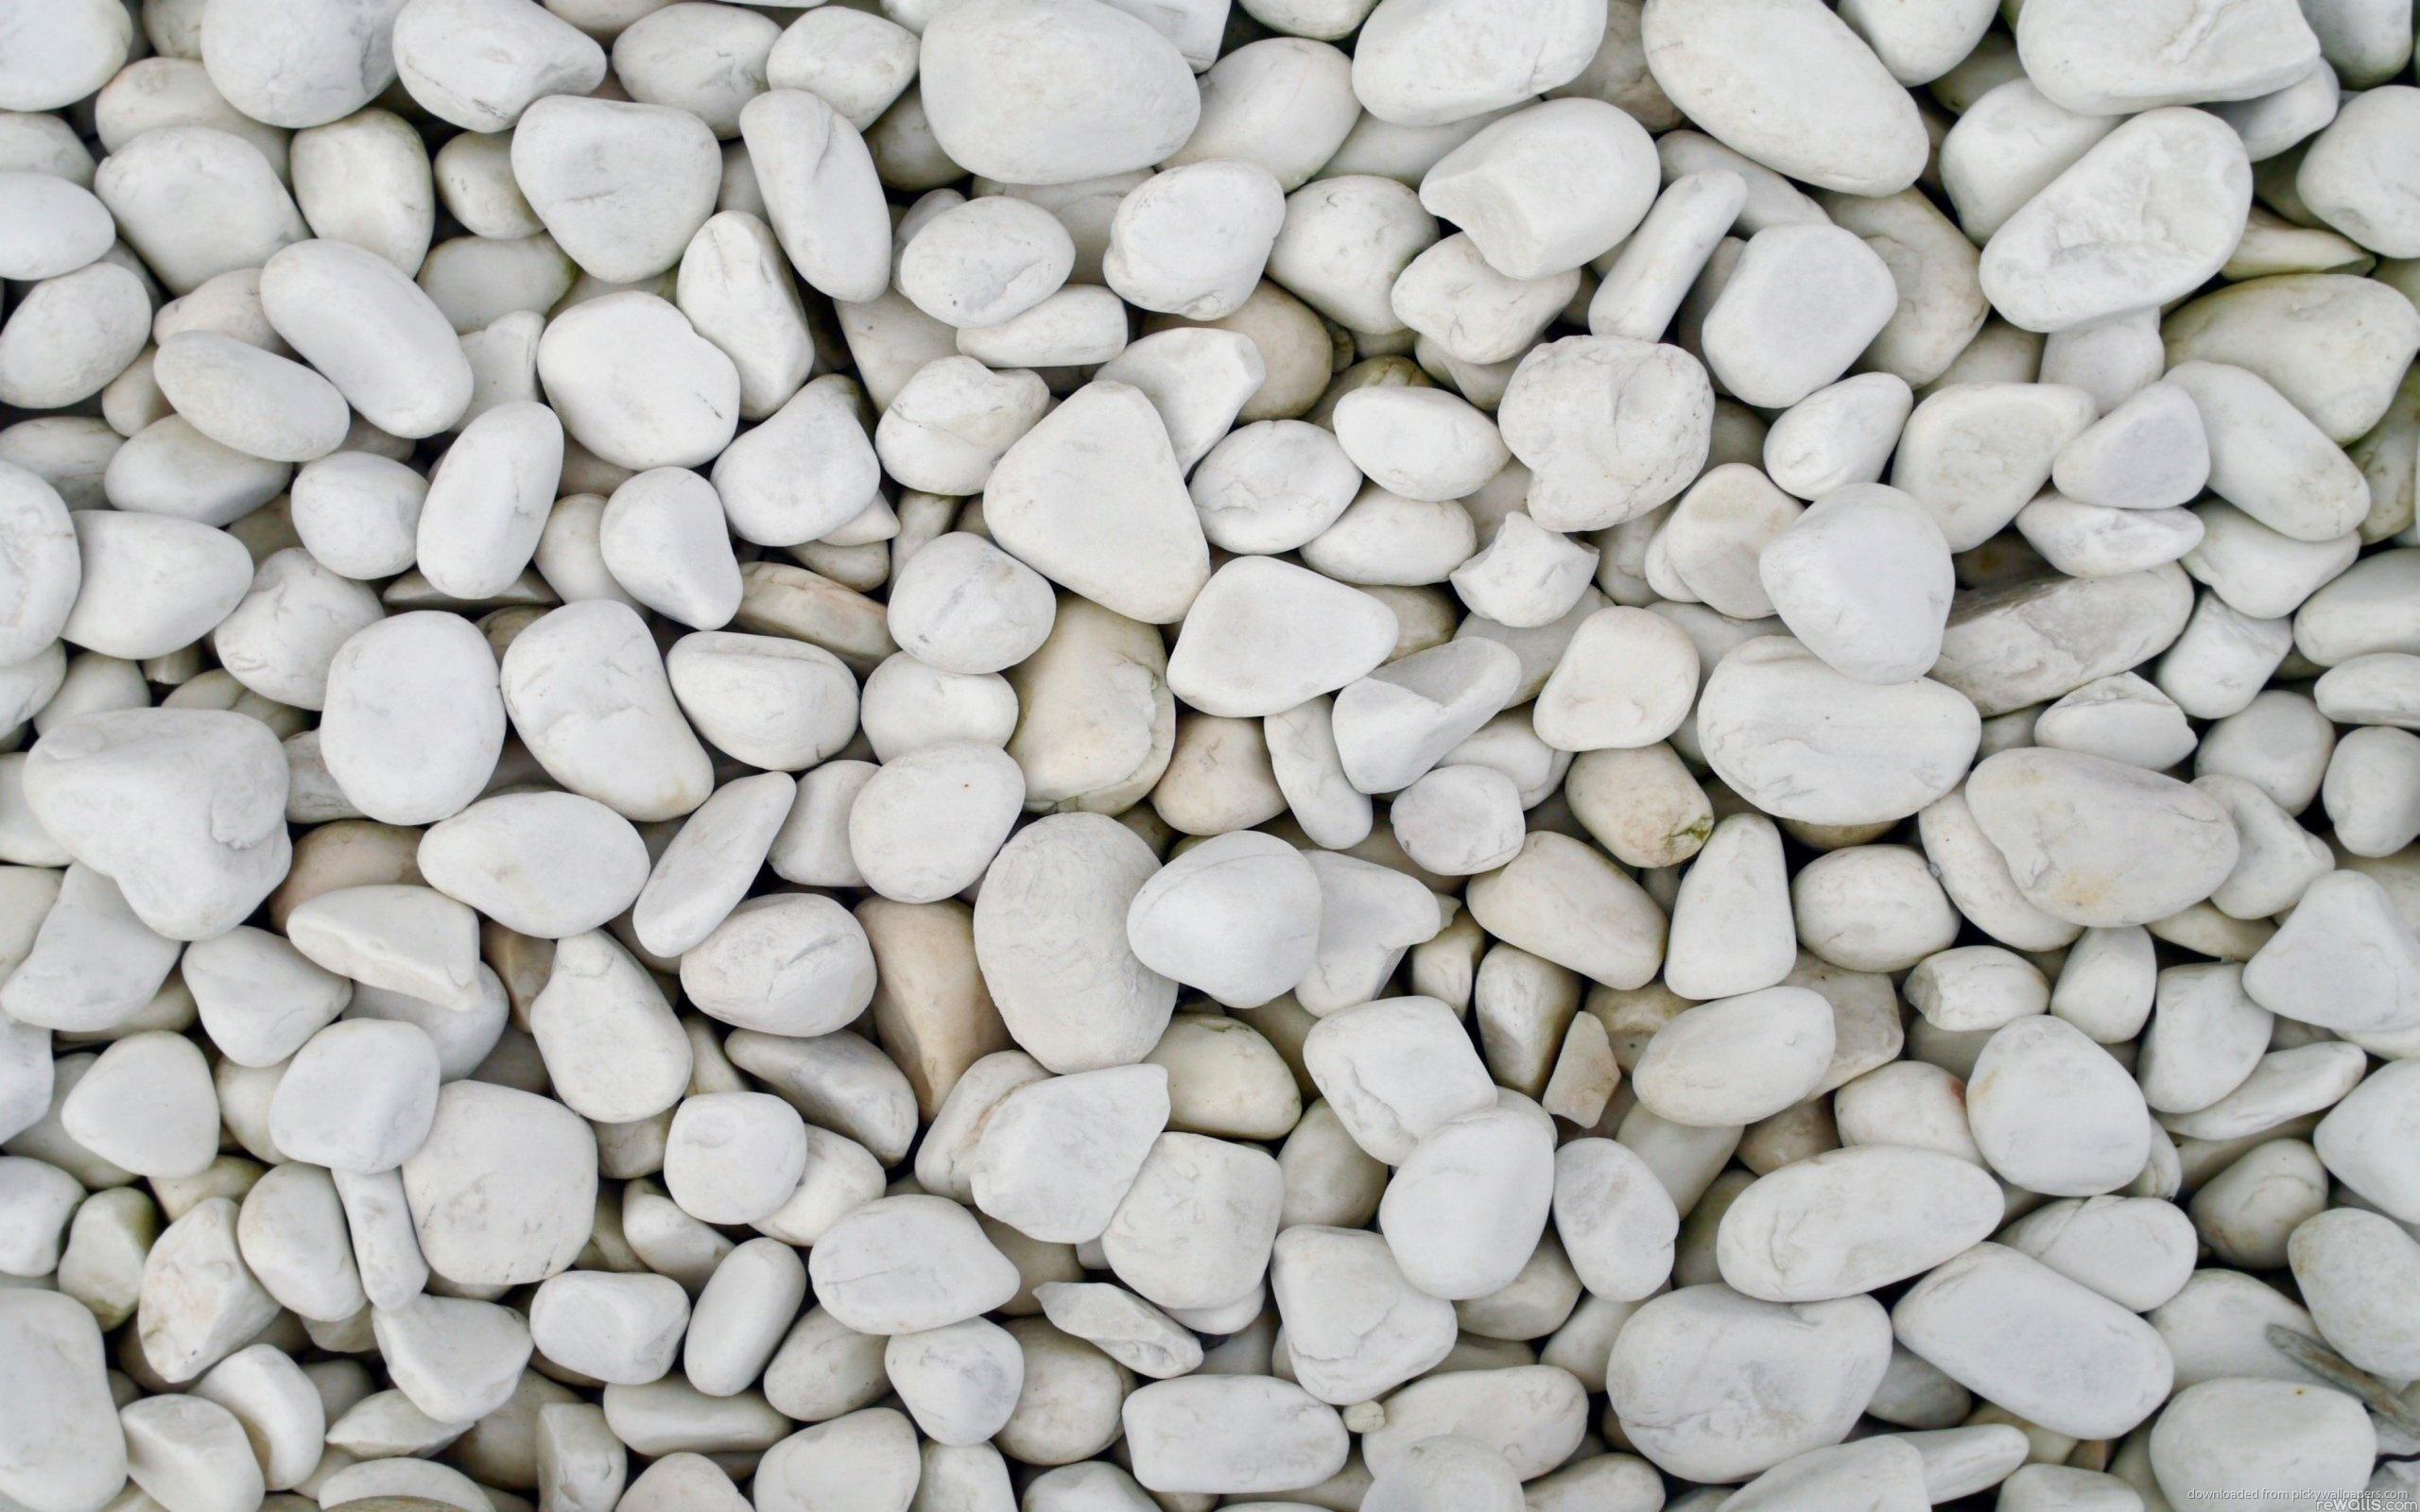 Anime Beach Wallpaper Pebbles Wallpaper 2560x1600 8424